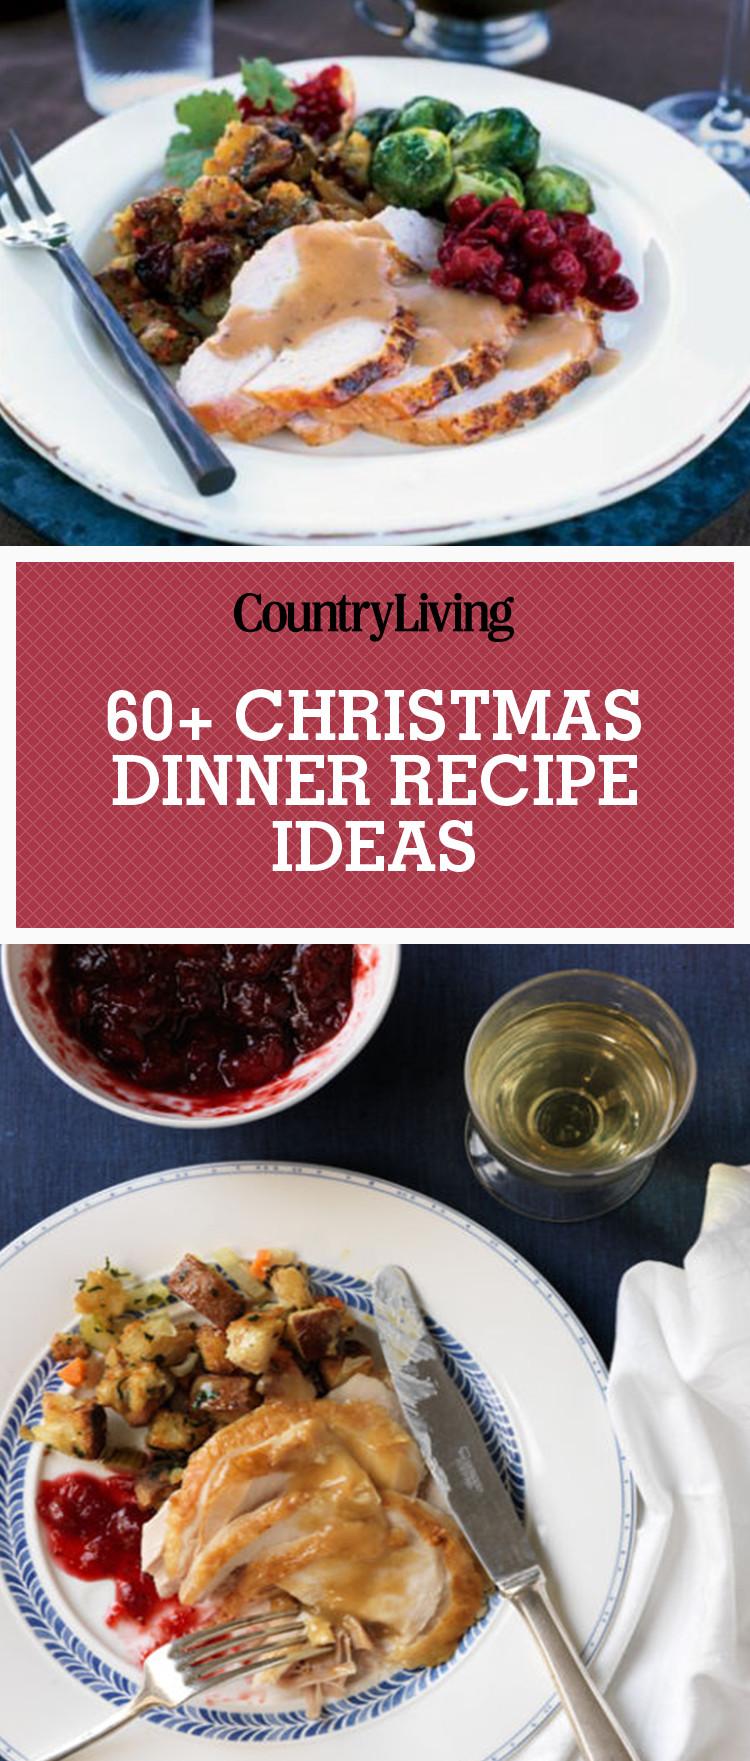 Christmas Recipes Dinner  70 Easy Christmas Dinner Ideas Best Holiday Meal Recipes